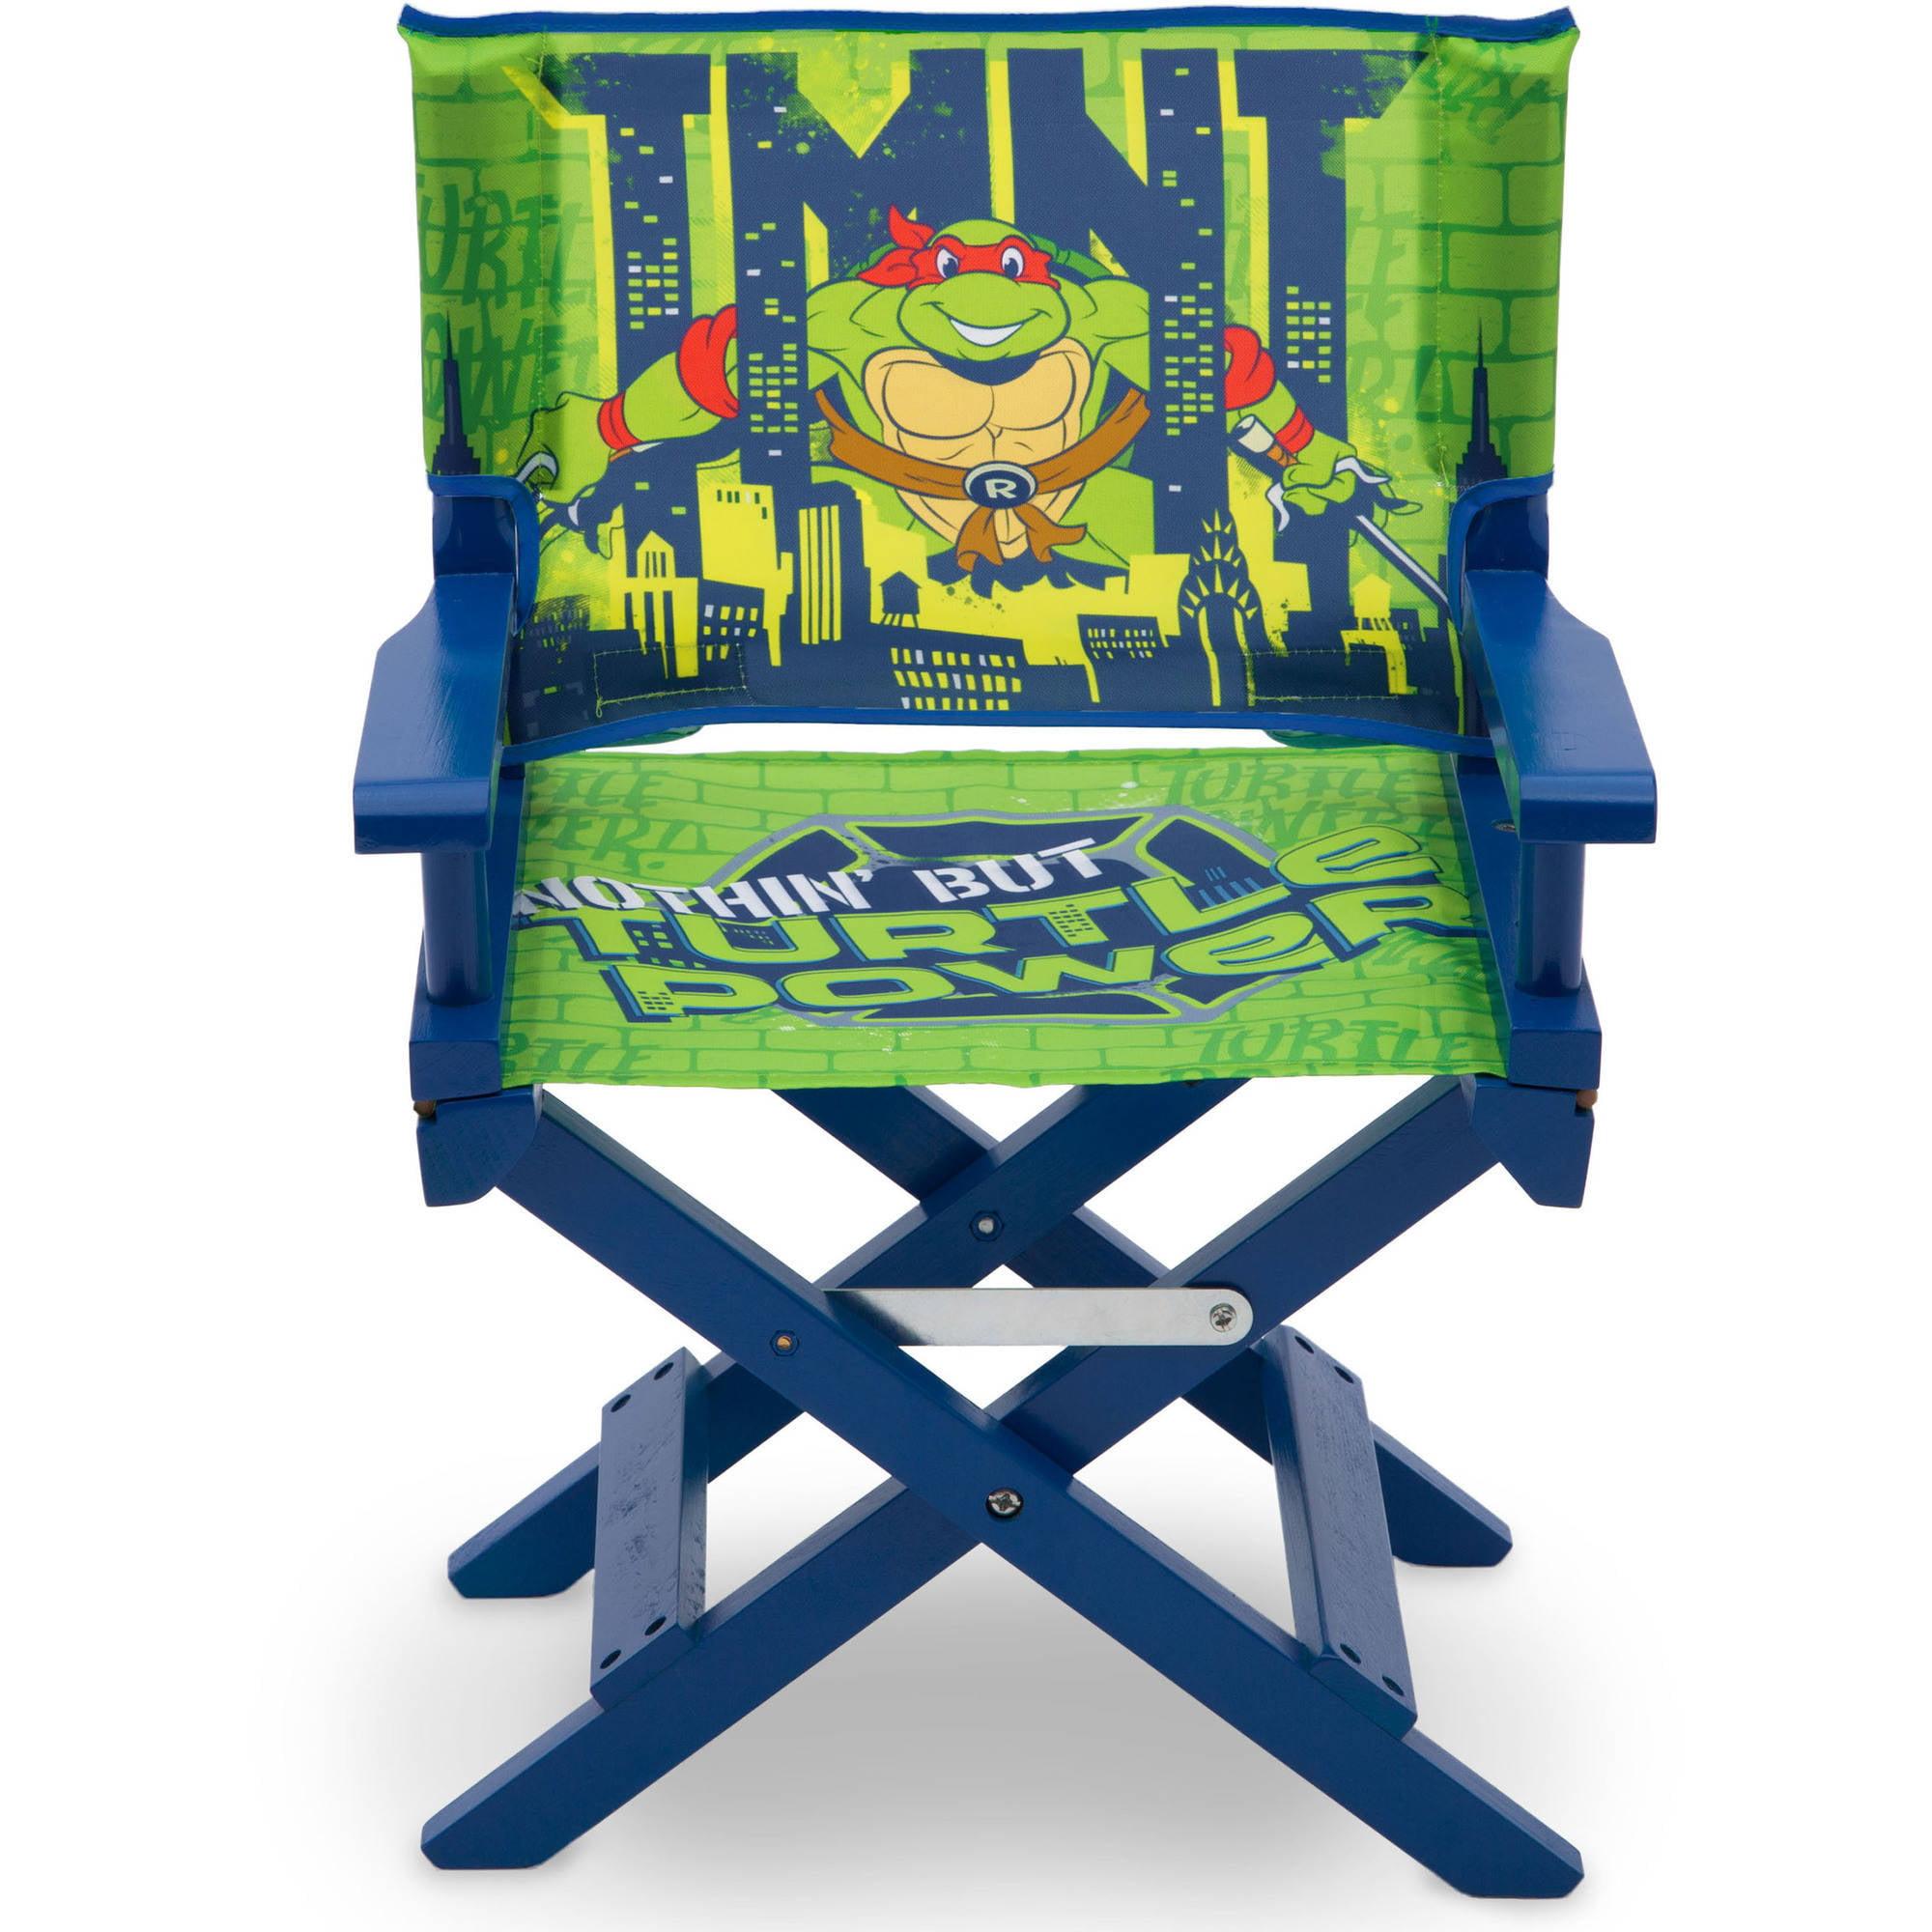 Nickelodeon Teenage Mutant Ninja Turtles Director's Chair